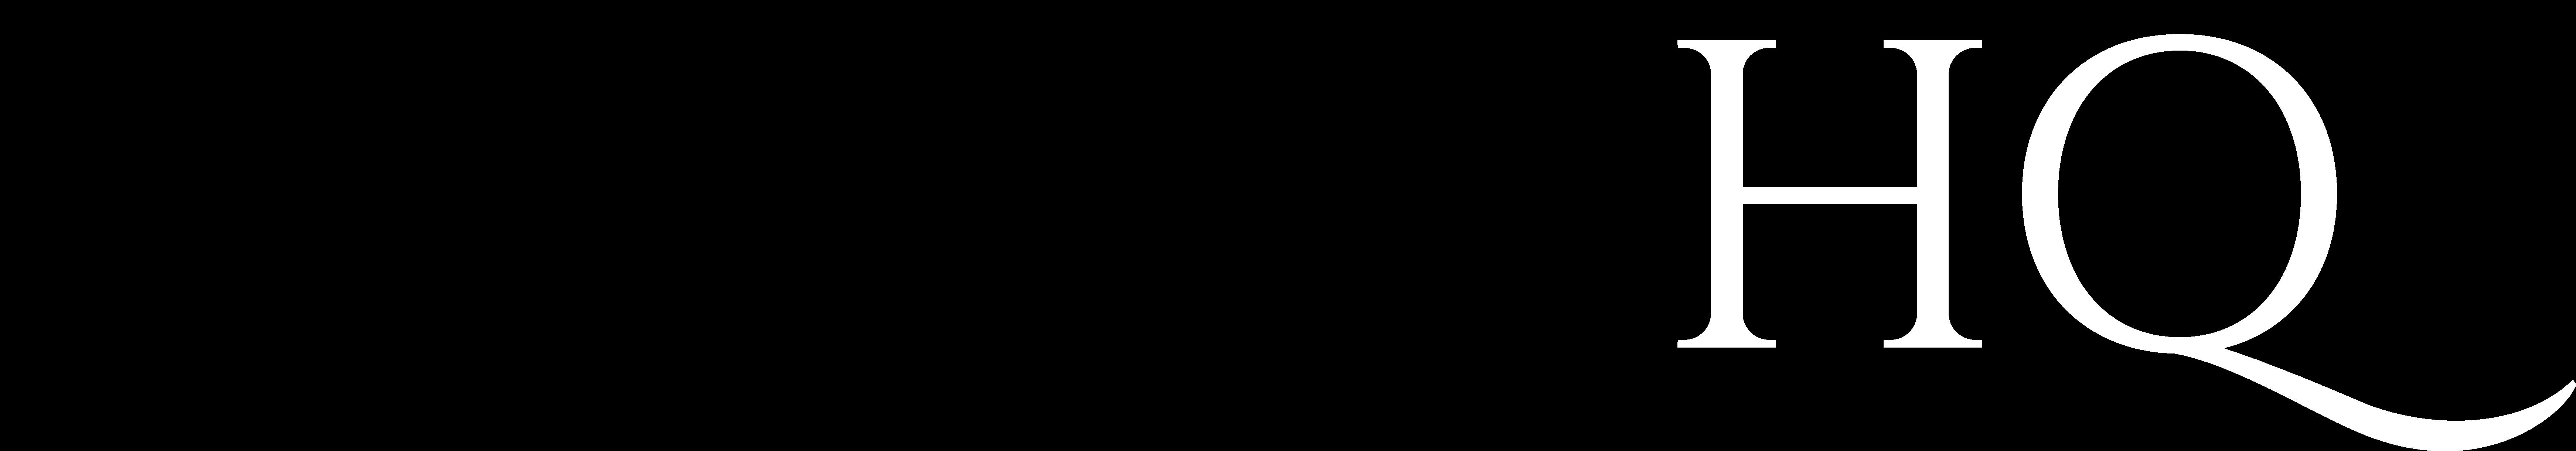 mammas-logo